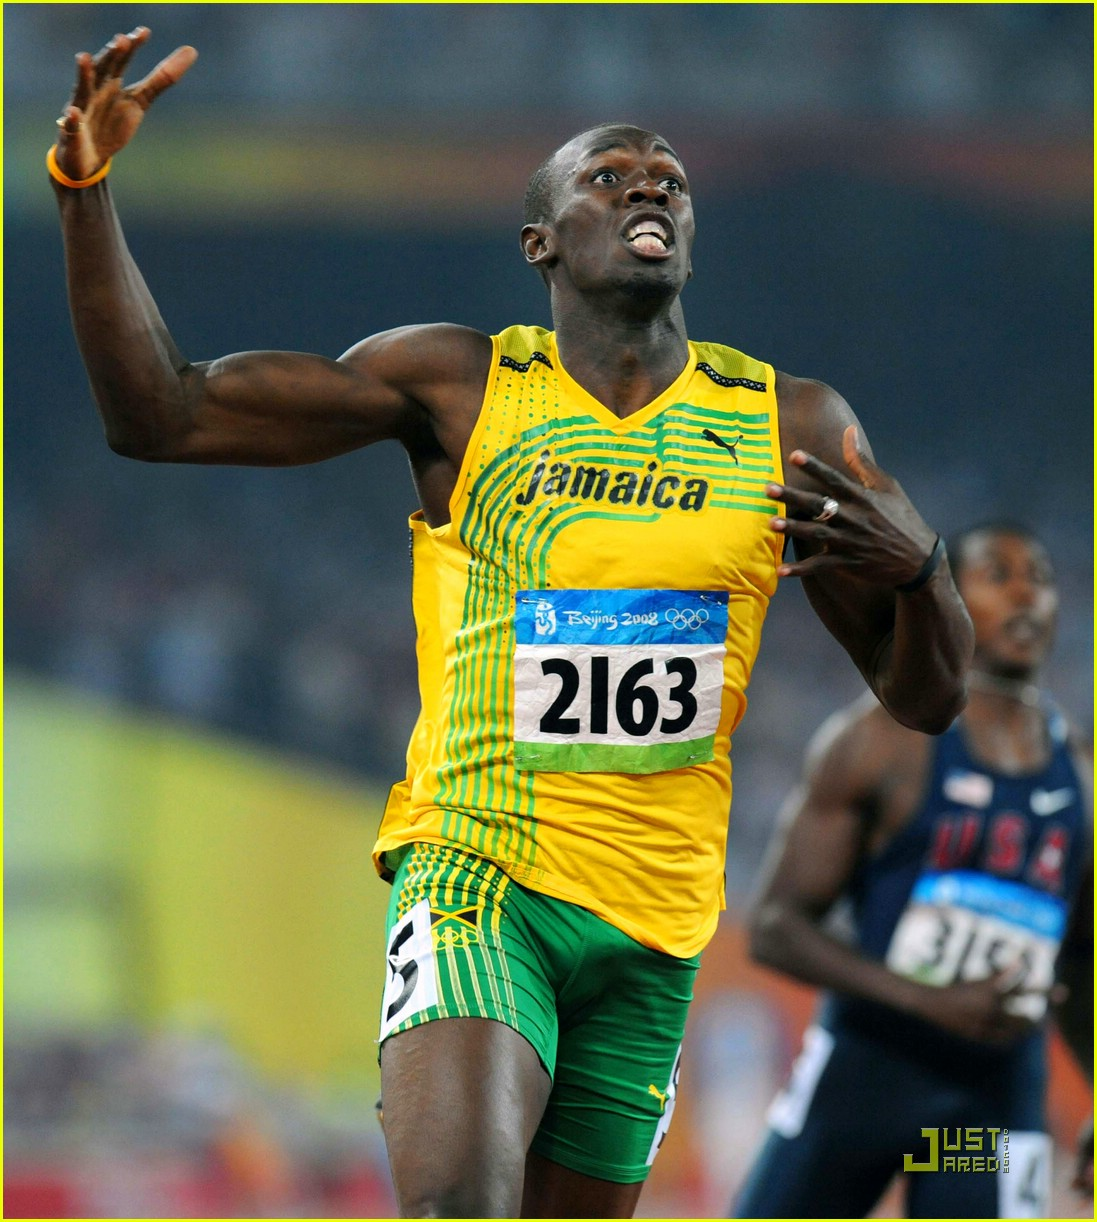 Full Sized Photo of usain bolt beijing olympics 100m 200m ...